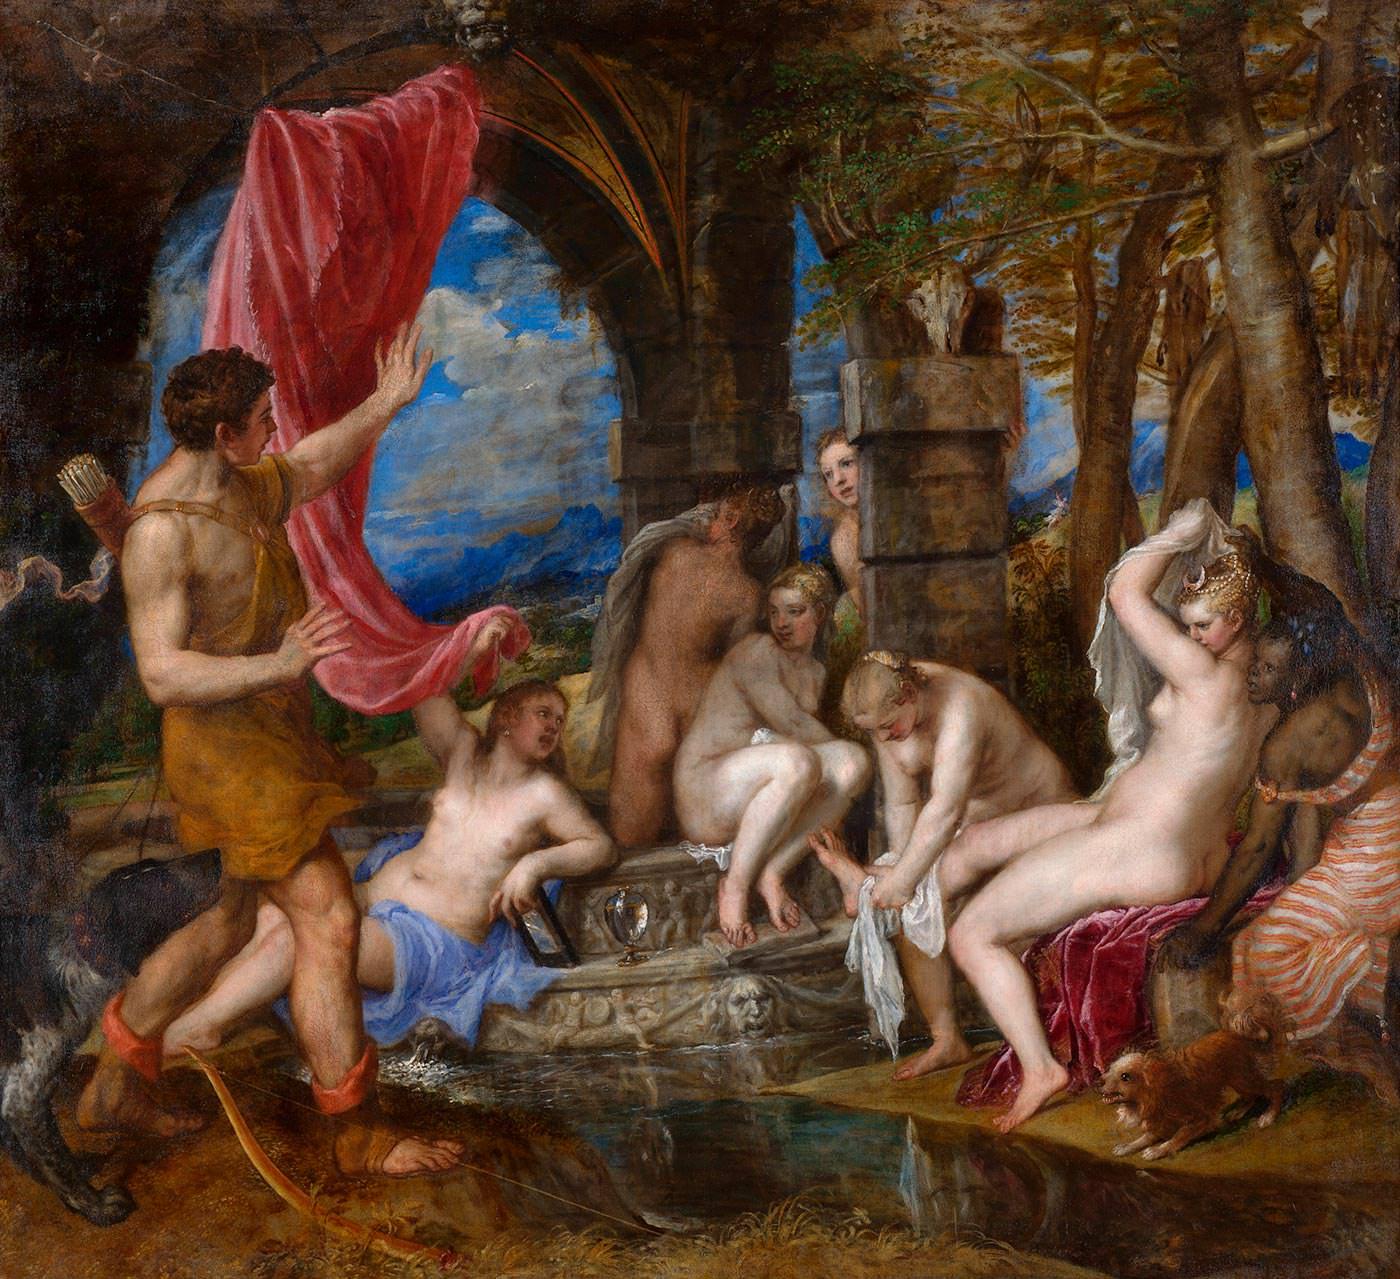 seks-i-erotika-galereya